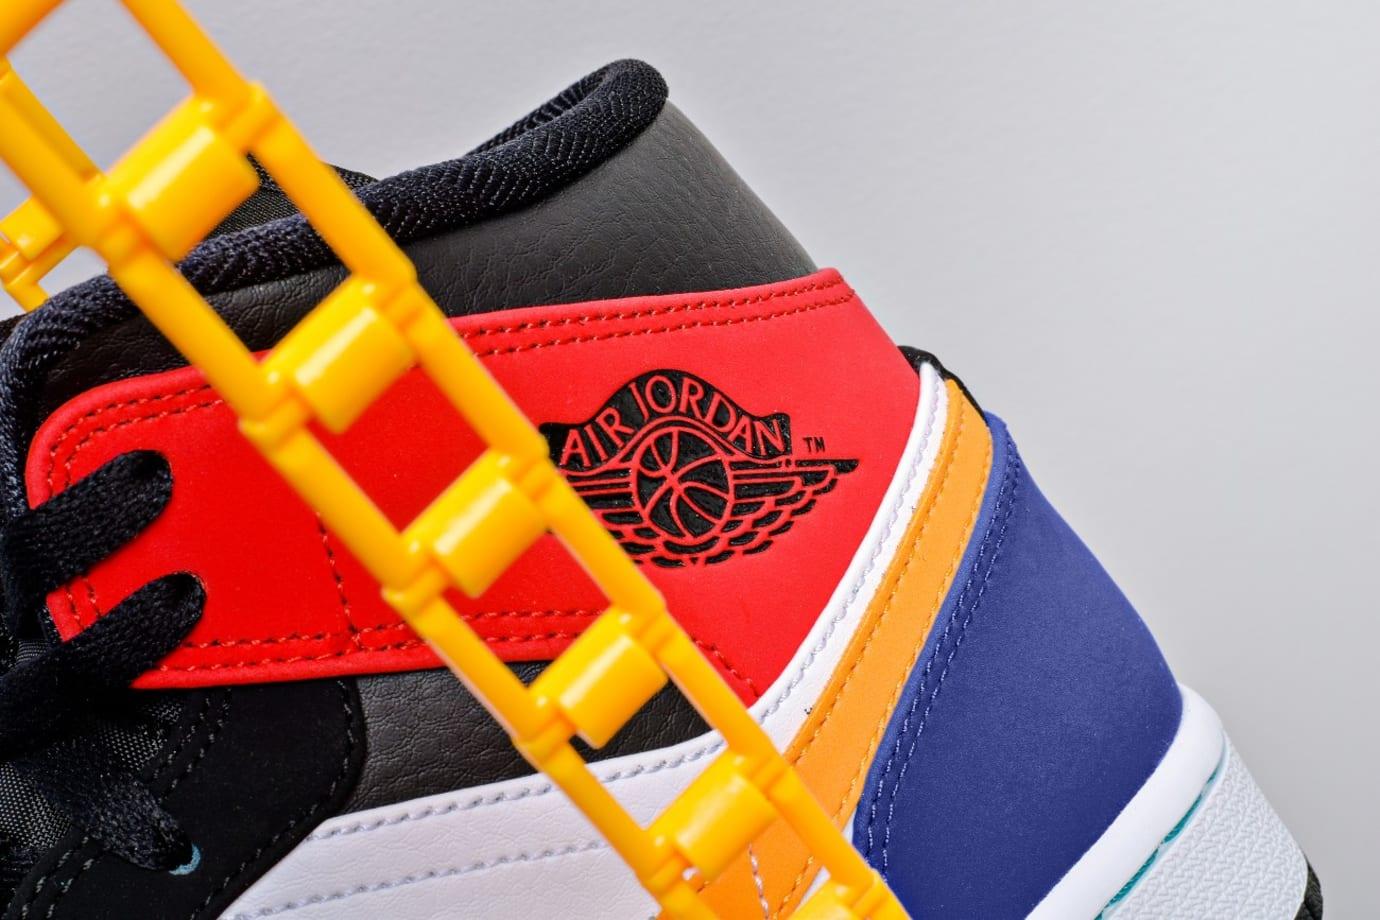 868b68915e54 Image via Xtreme.pt · Air Jordan 1 Mid  Multicolor  554724-125 (Heel Detail)